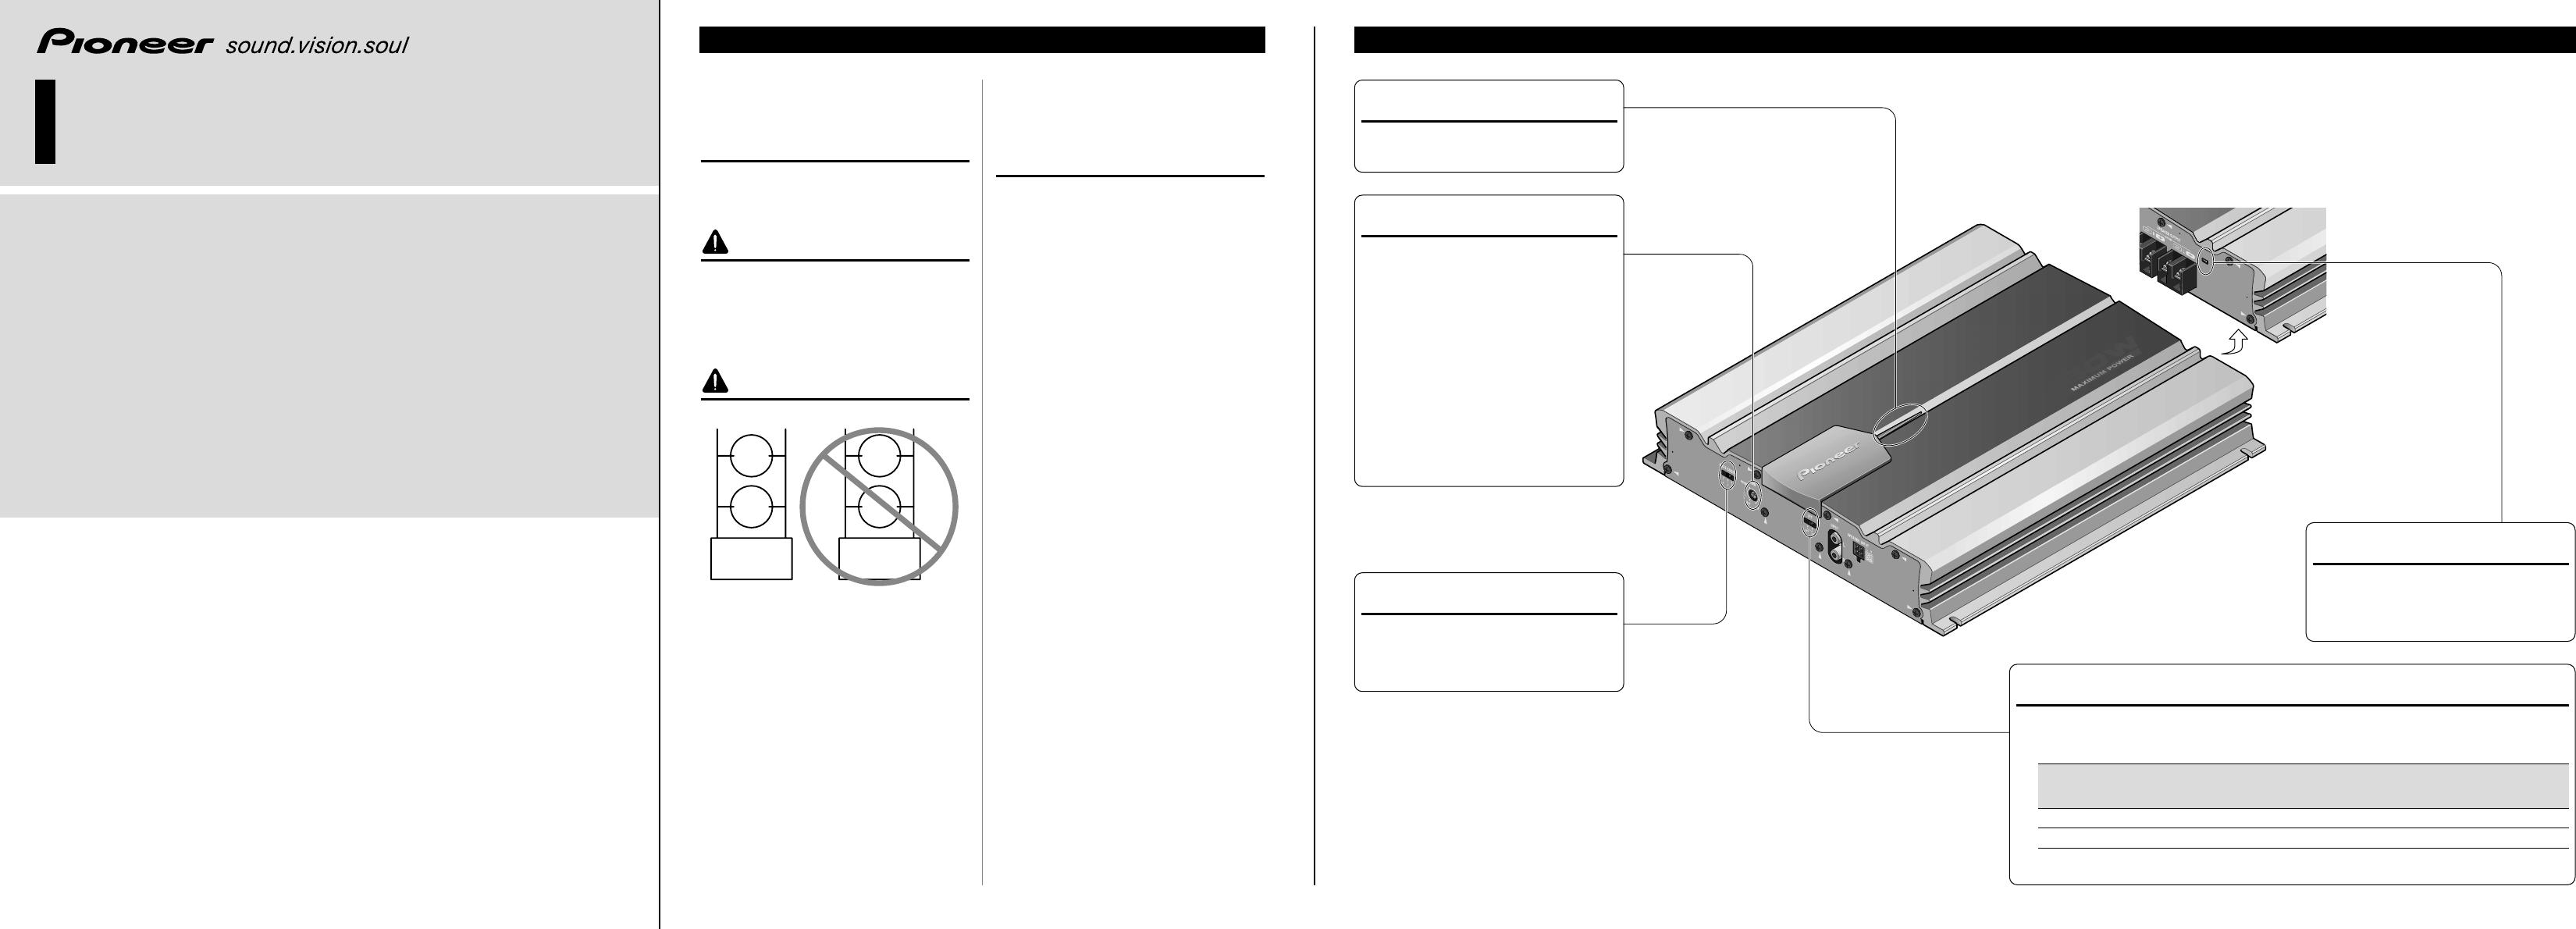 pioneer gm 5500t wiring diagram wiring diagrams schematics pioneer gm 5100t manual amplificador on pioneer gm